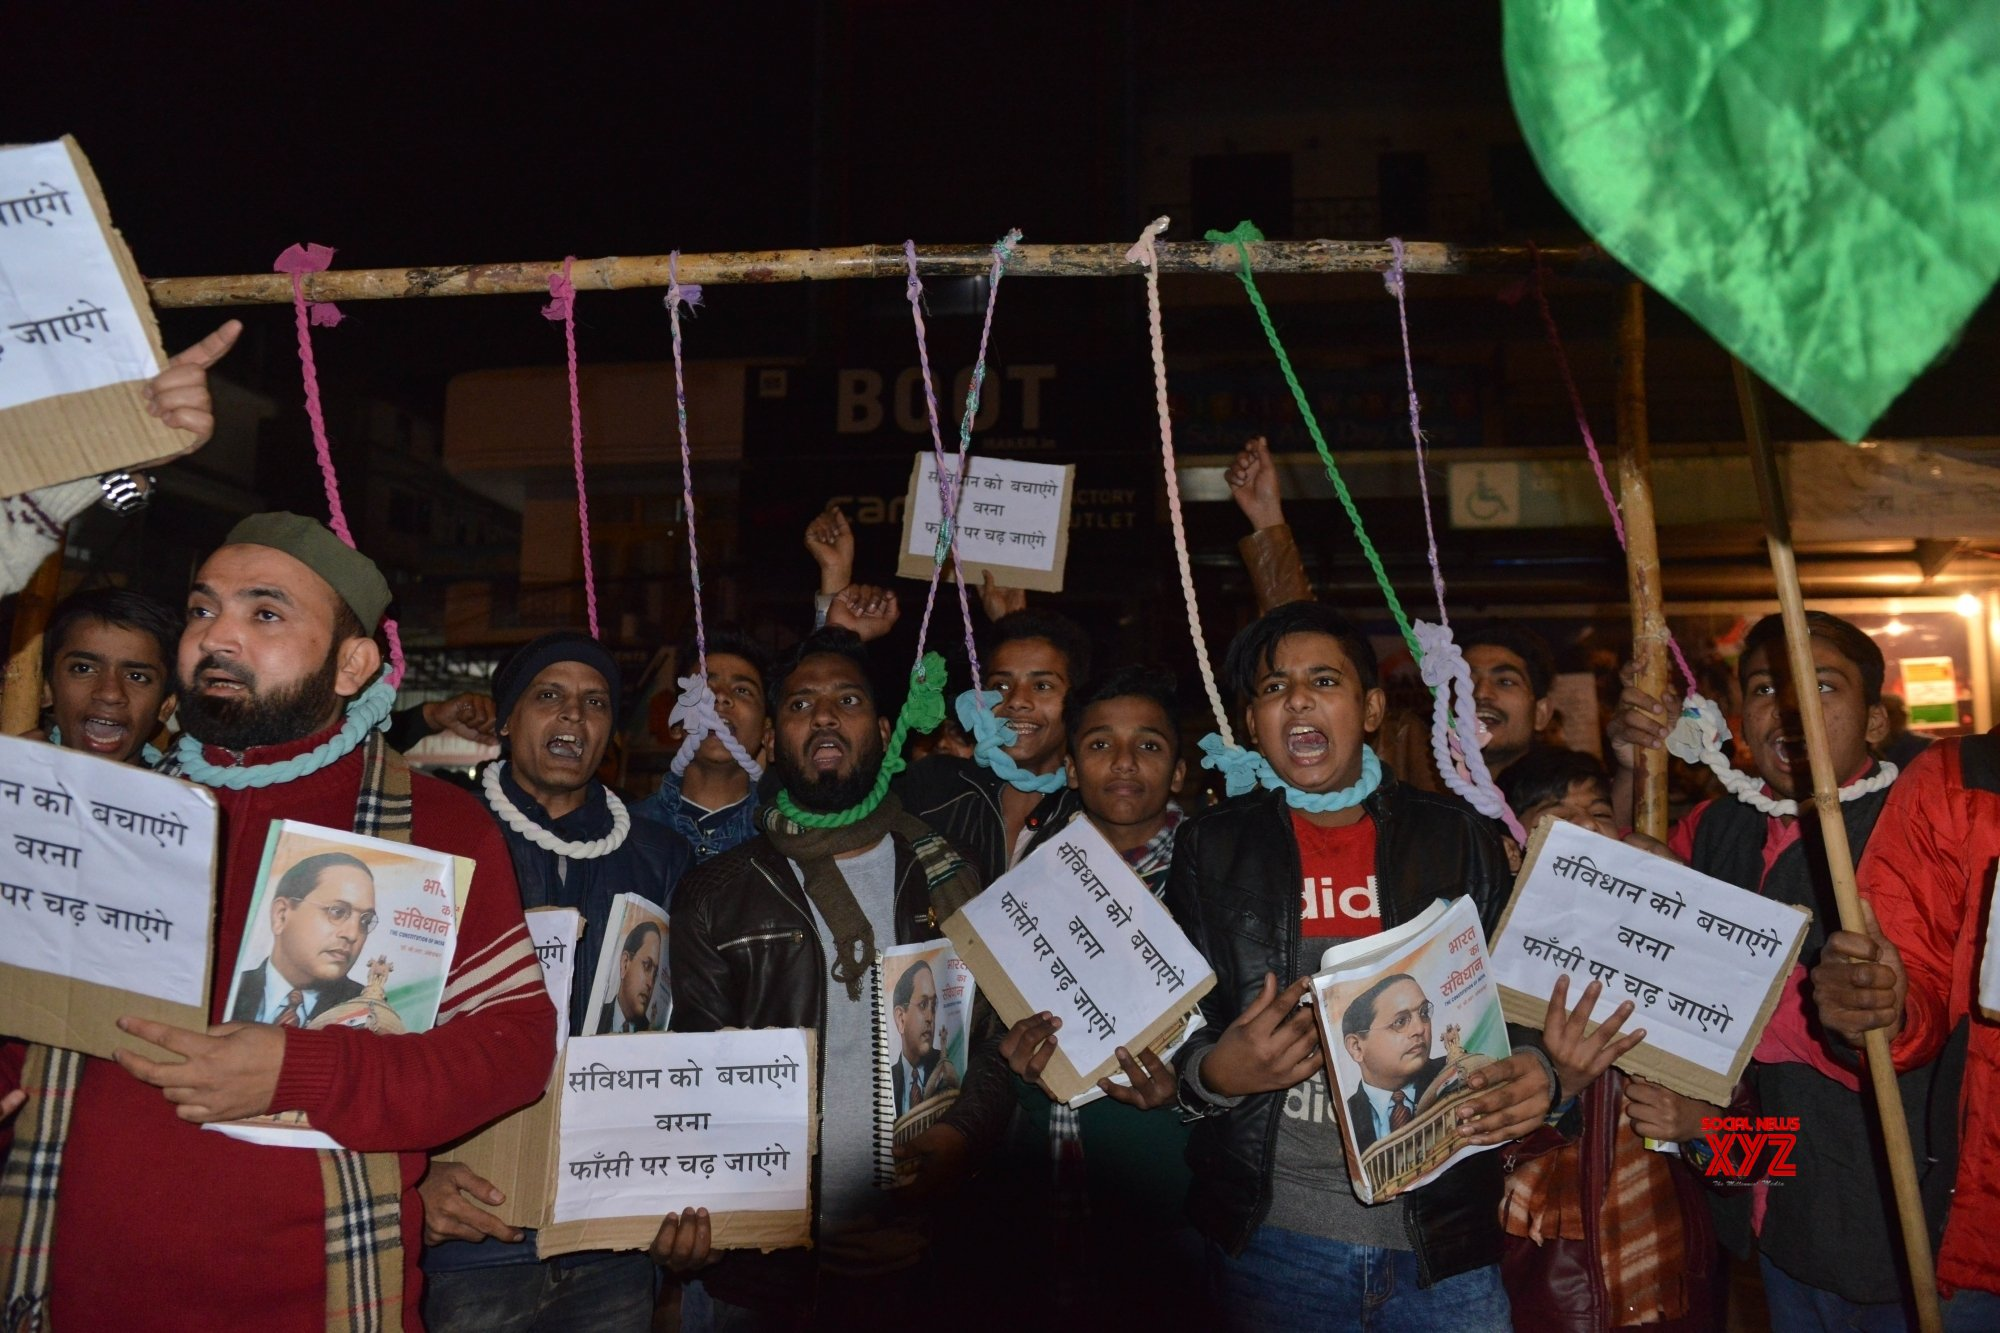 New Delhi: Protest against CAA - NRC - NPR at Shaheen Bagh (Batch - 2) #Gallery